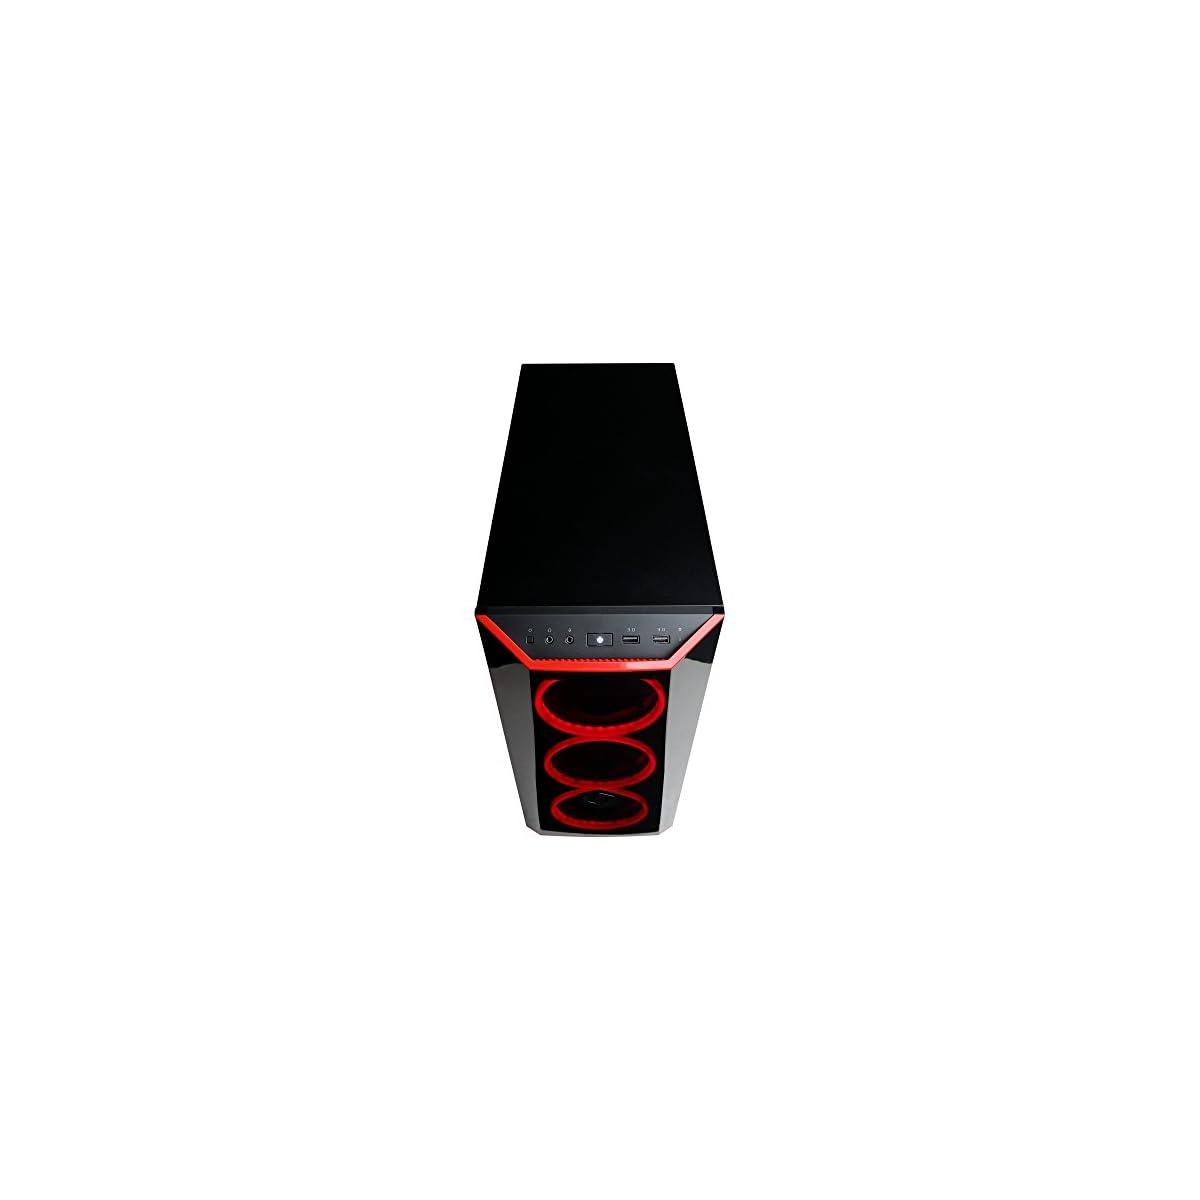 CYBERPOWERPC Gamer Xtreme GXIVR8020A5 Desktop Gaming PC (Intel i5-8400 6  Core Processor, AMD RX 580 4GB, 8GB DDR4 RAM, 1TB 7200RPM HDD, WiFi, Win 10